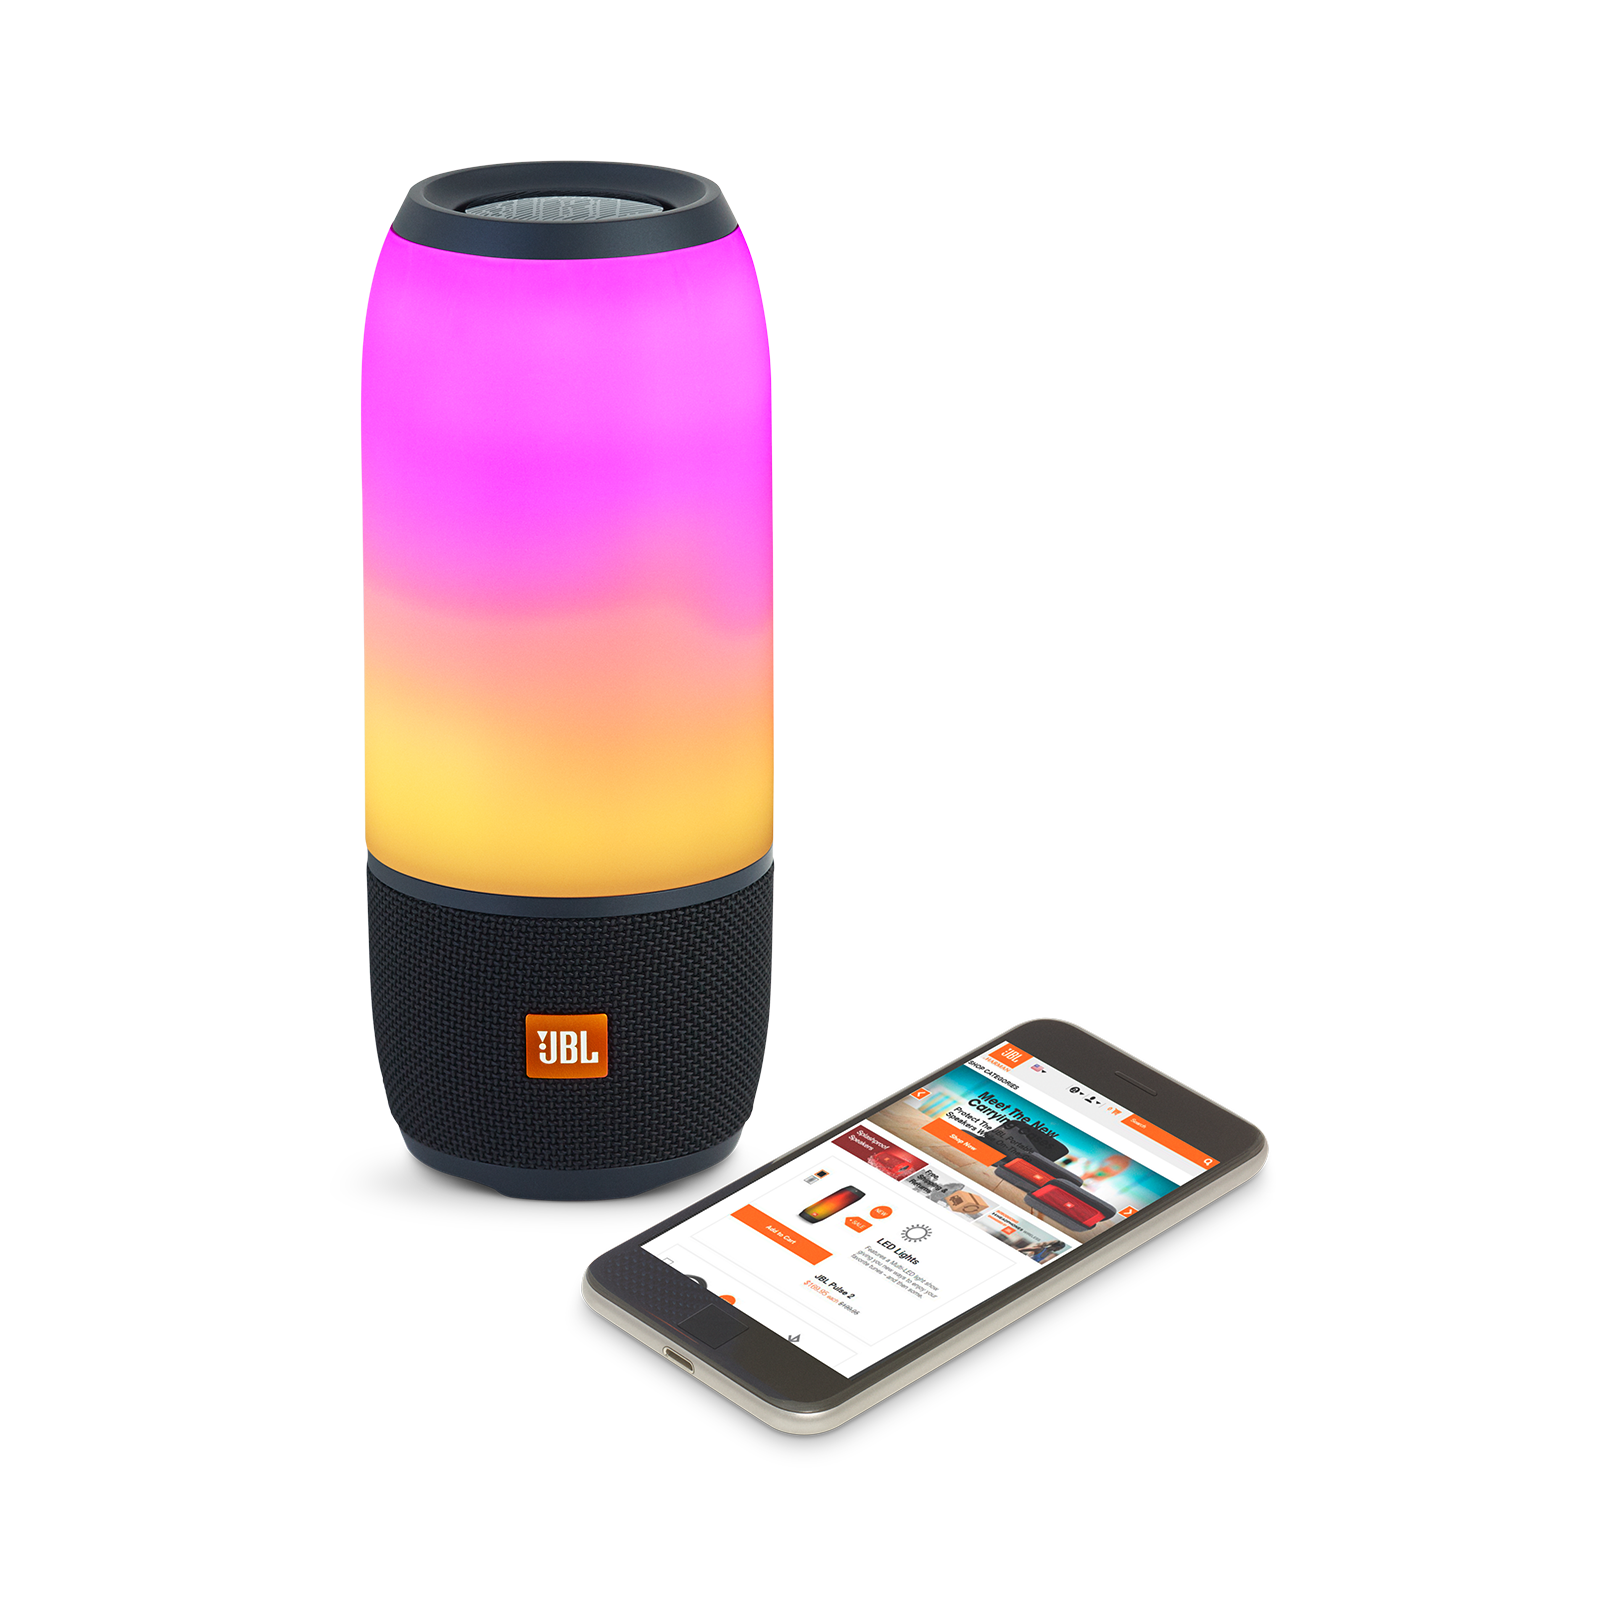 Pulse 3 - Black - Waterproof portable Bluetooth speaker with 360° lightshow and sound. - Detailshot 3